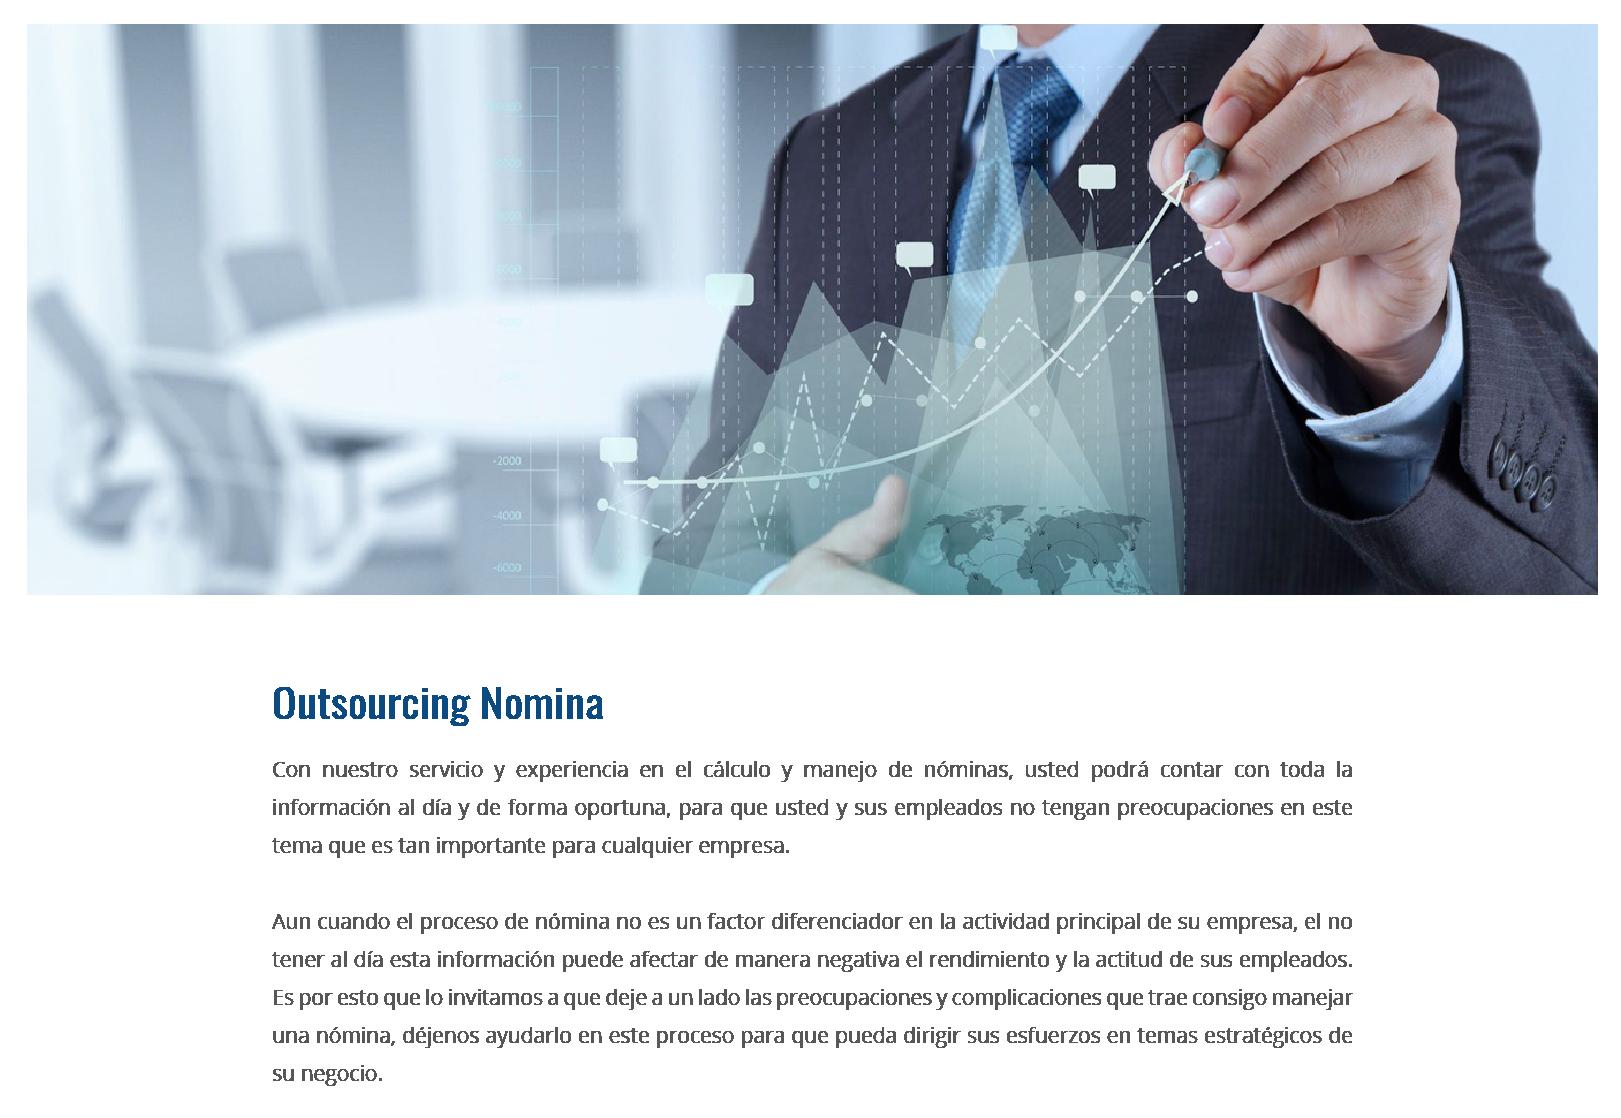 Outsourcing Nomina